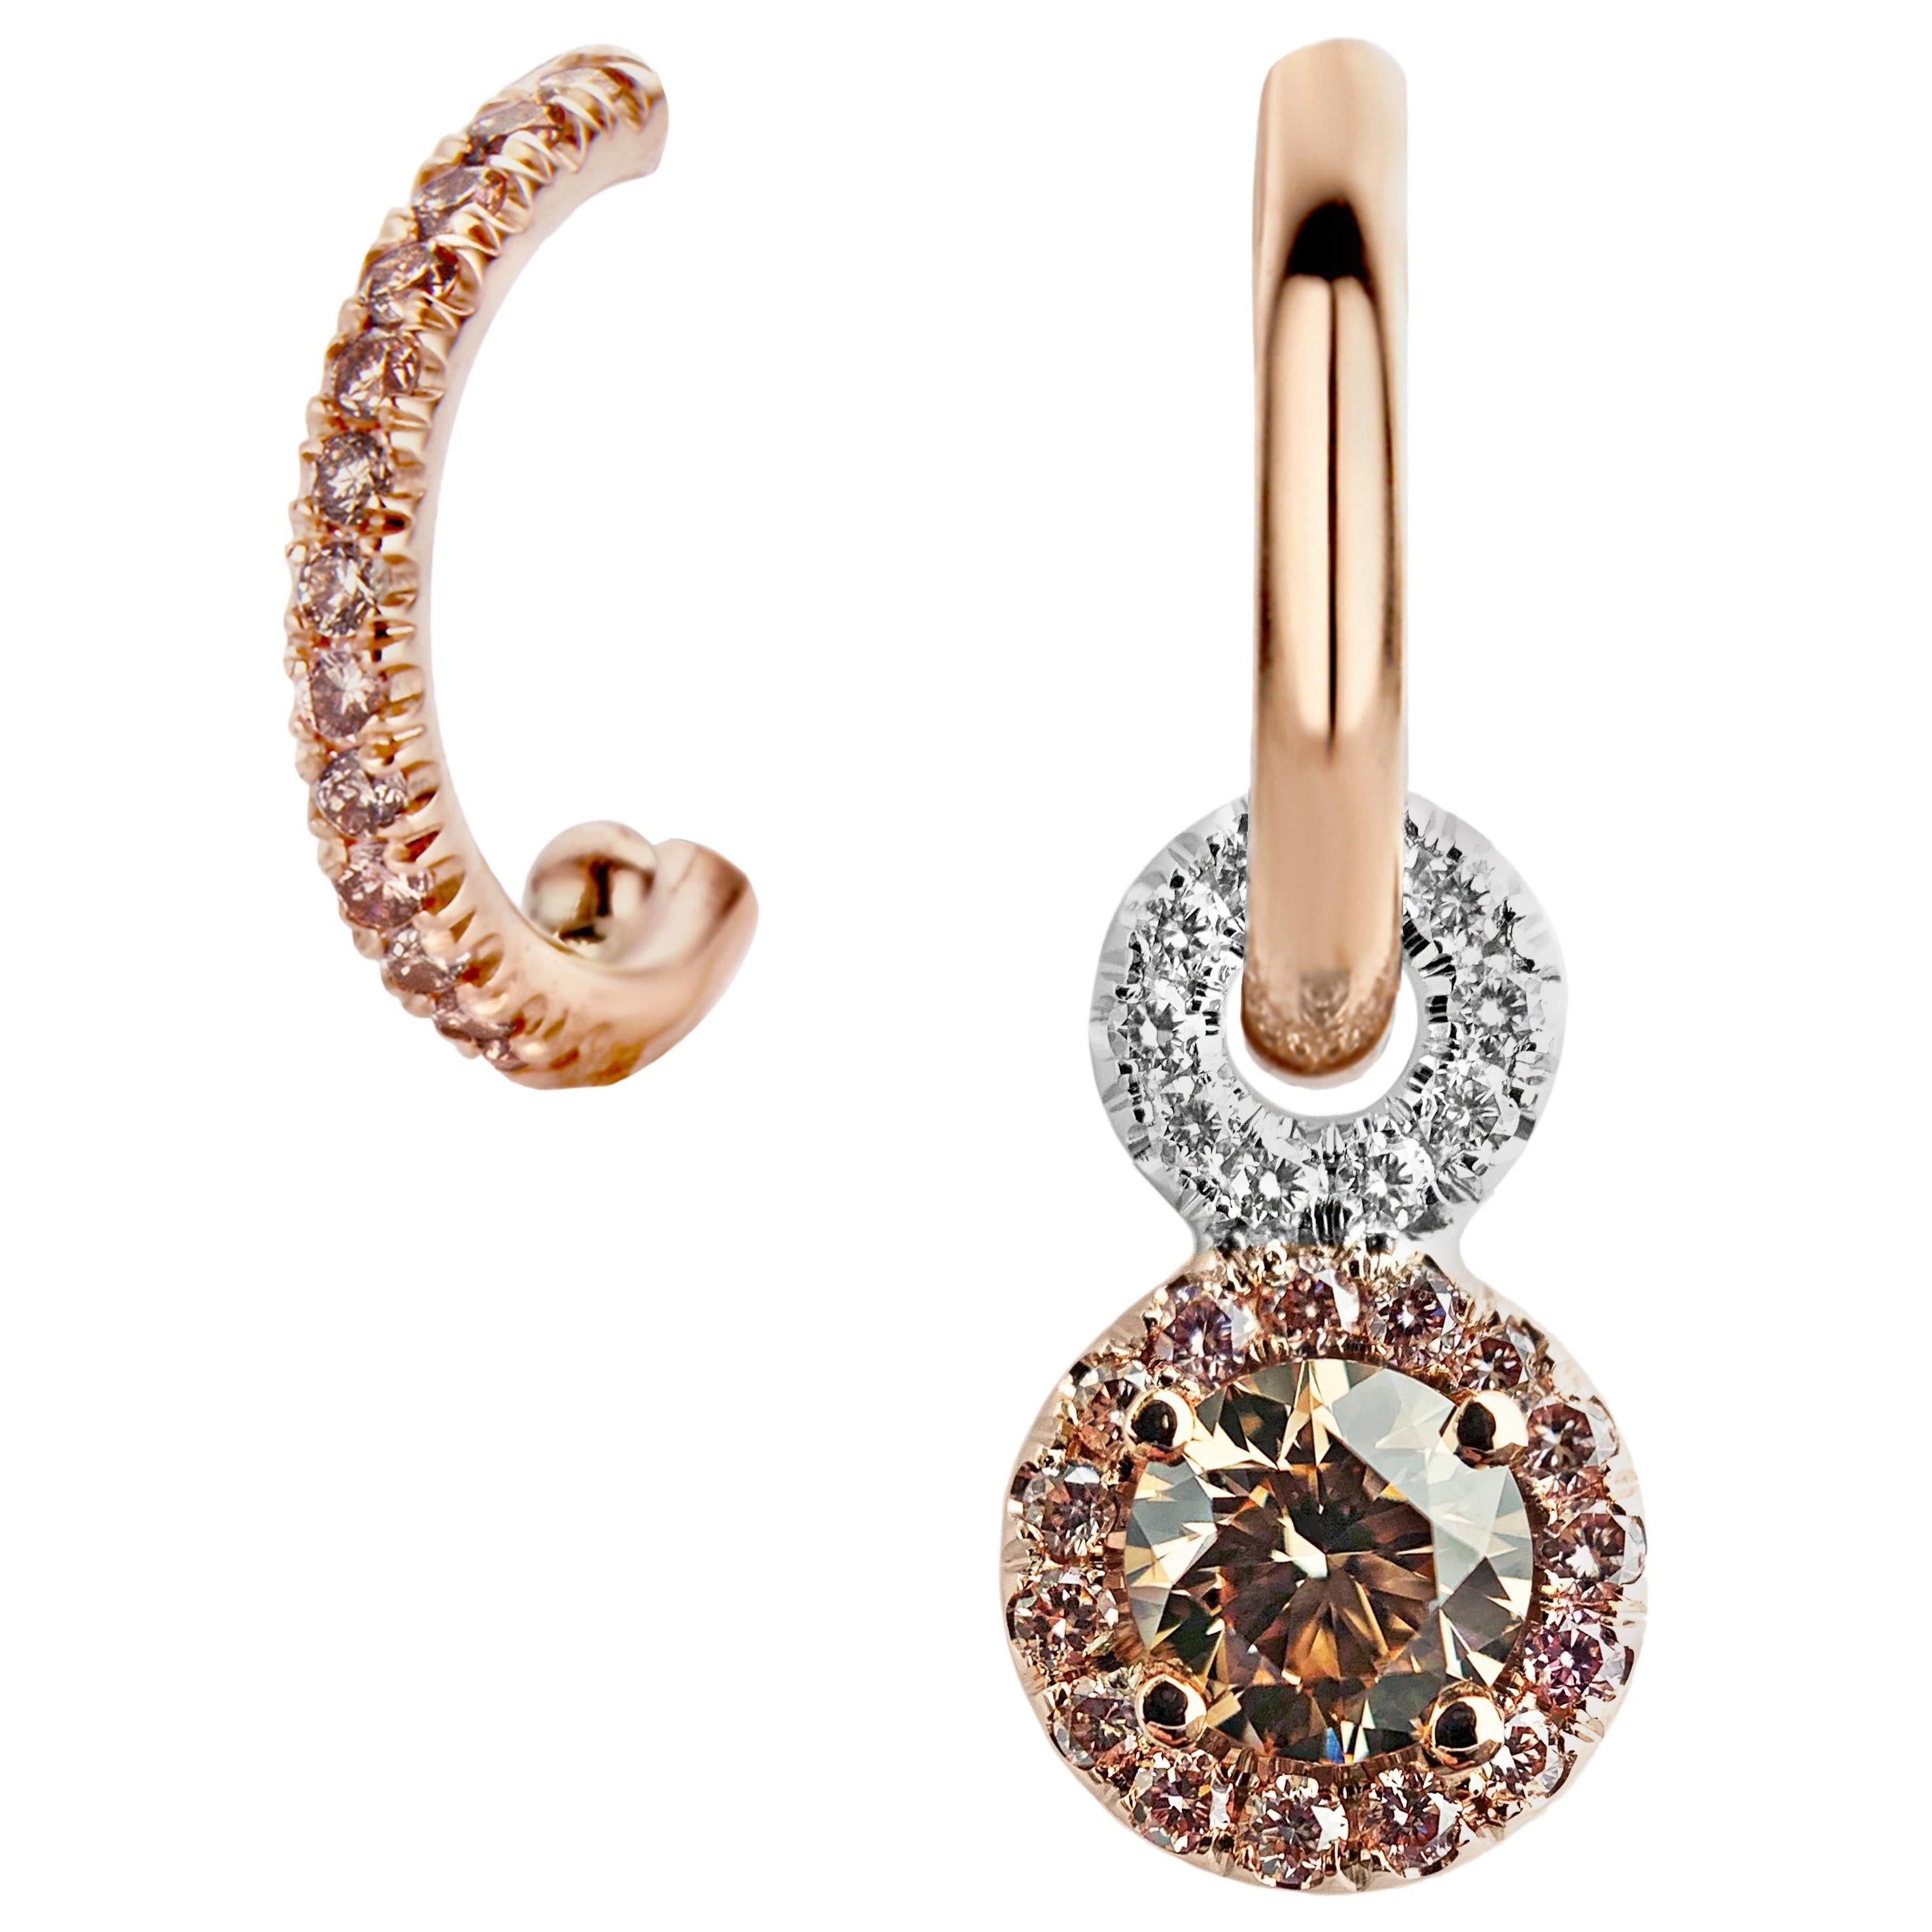 Joke Quick Handmade Mismatched Brown Pink White Diamond Earrings